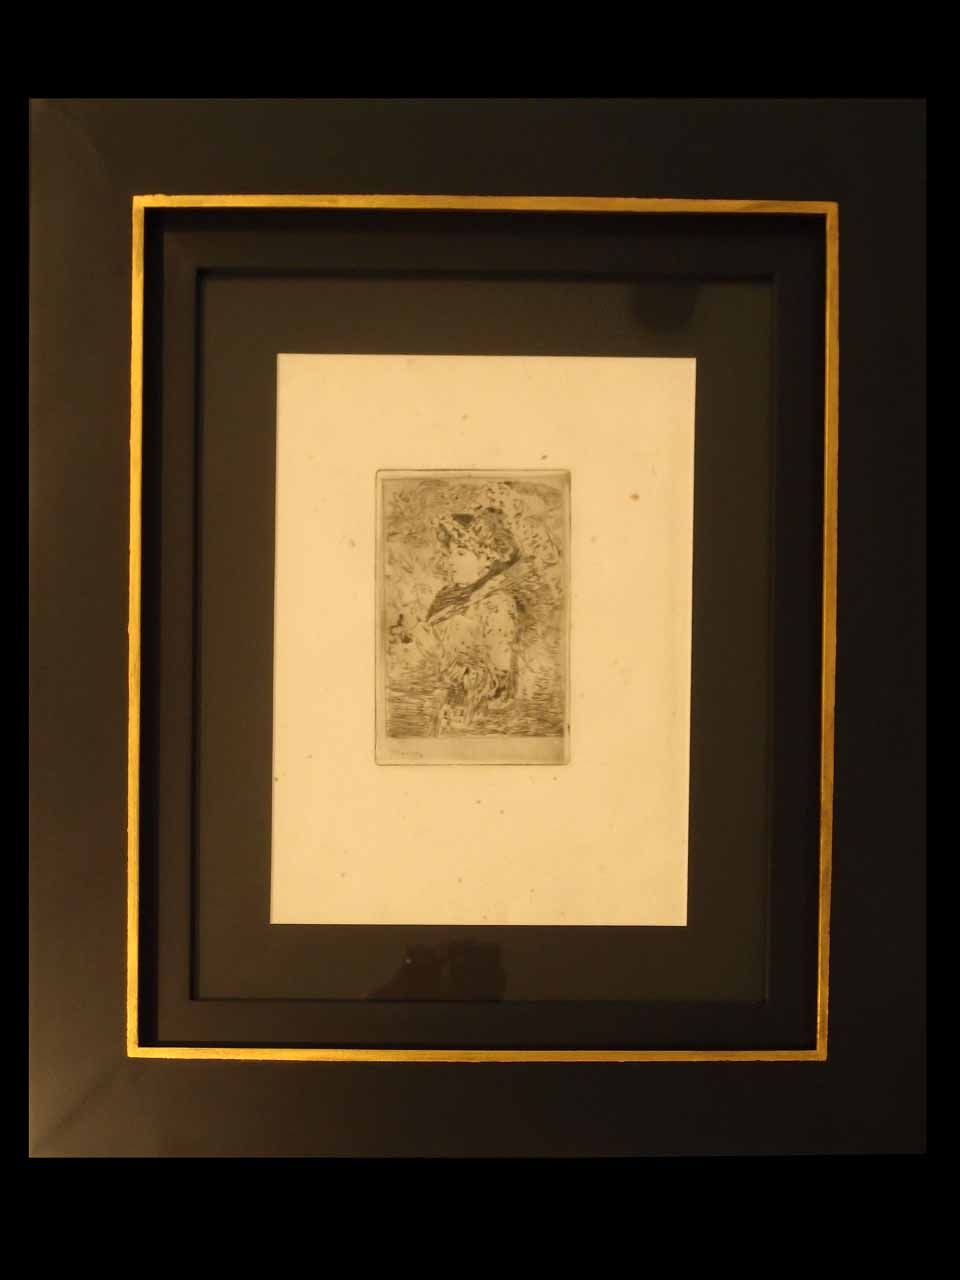 Édouard Manet (1832-1883) Jeanne. Original Etching